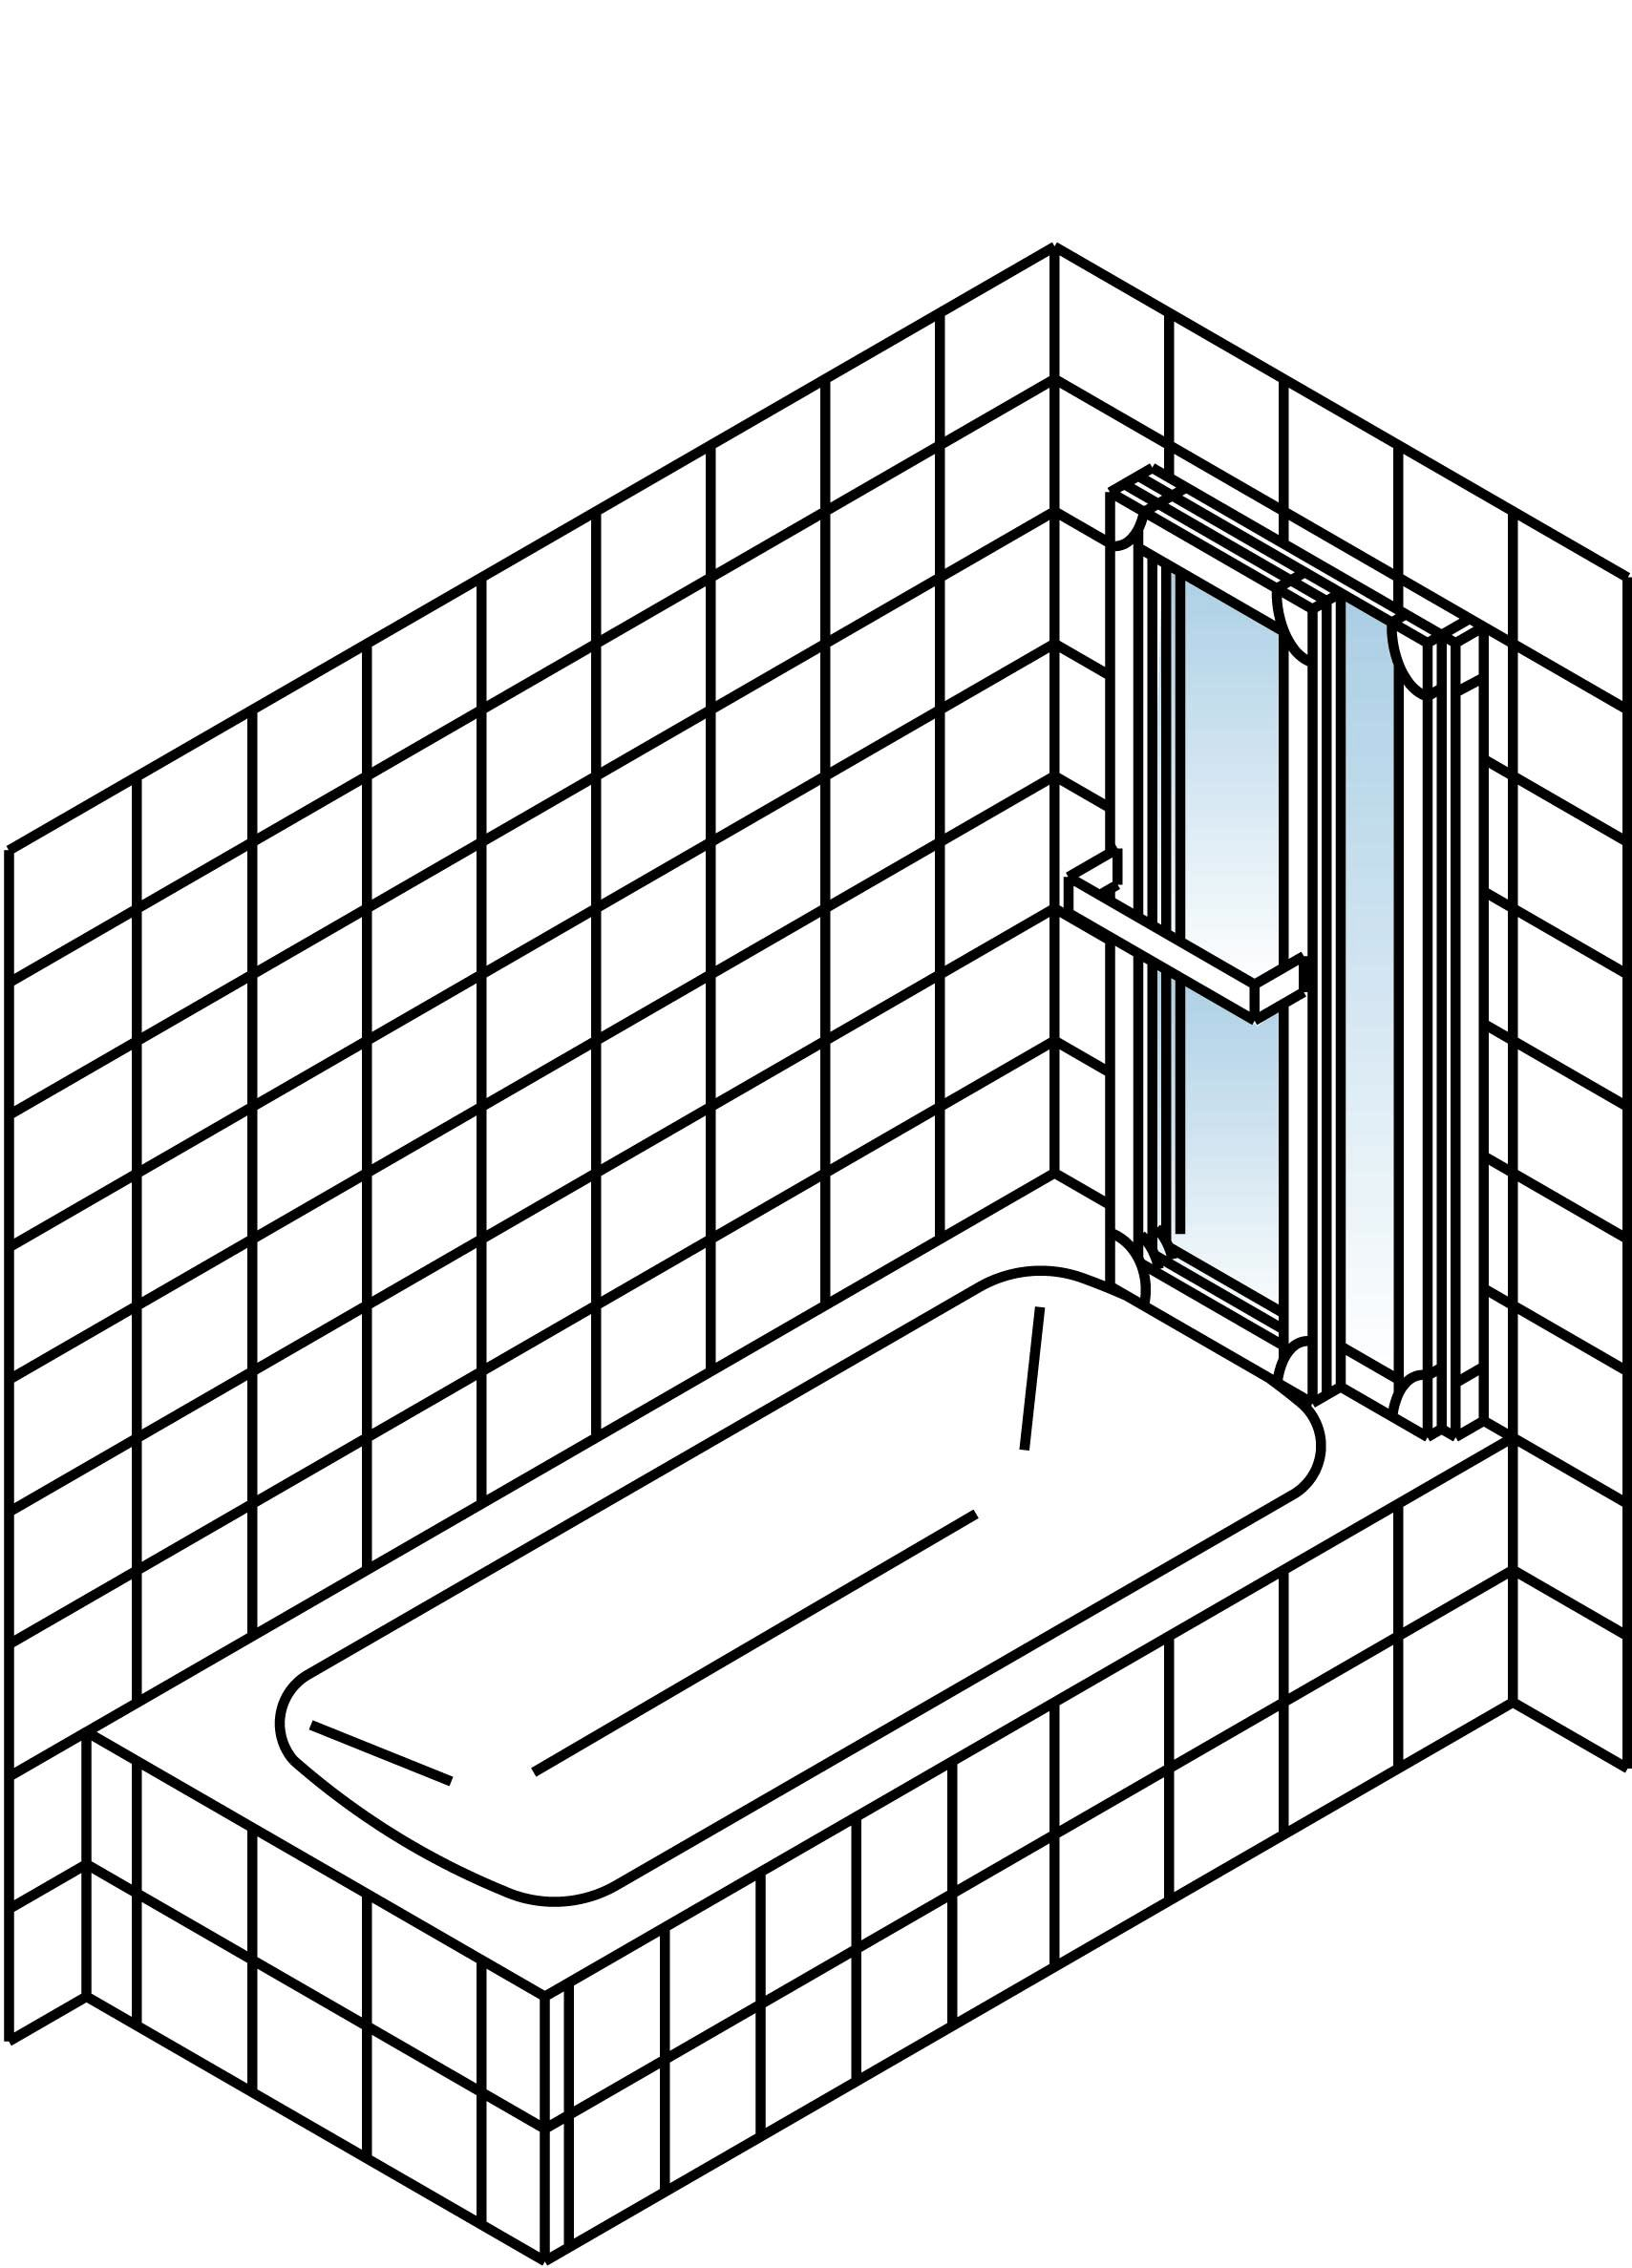 schulte komfort badewannenfaltwand 3 teilig klar hell alunatur 1518mm d1410 01 50 rechts. Black Bedroom Furniture Sets. Home Design Ideas